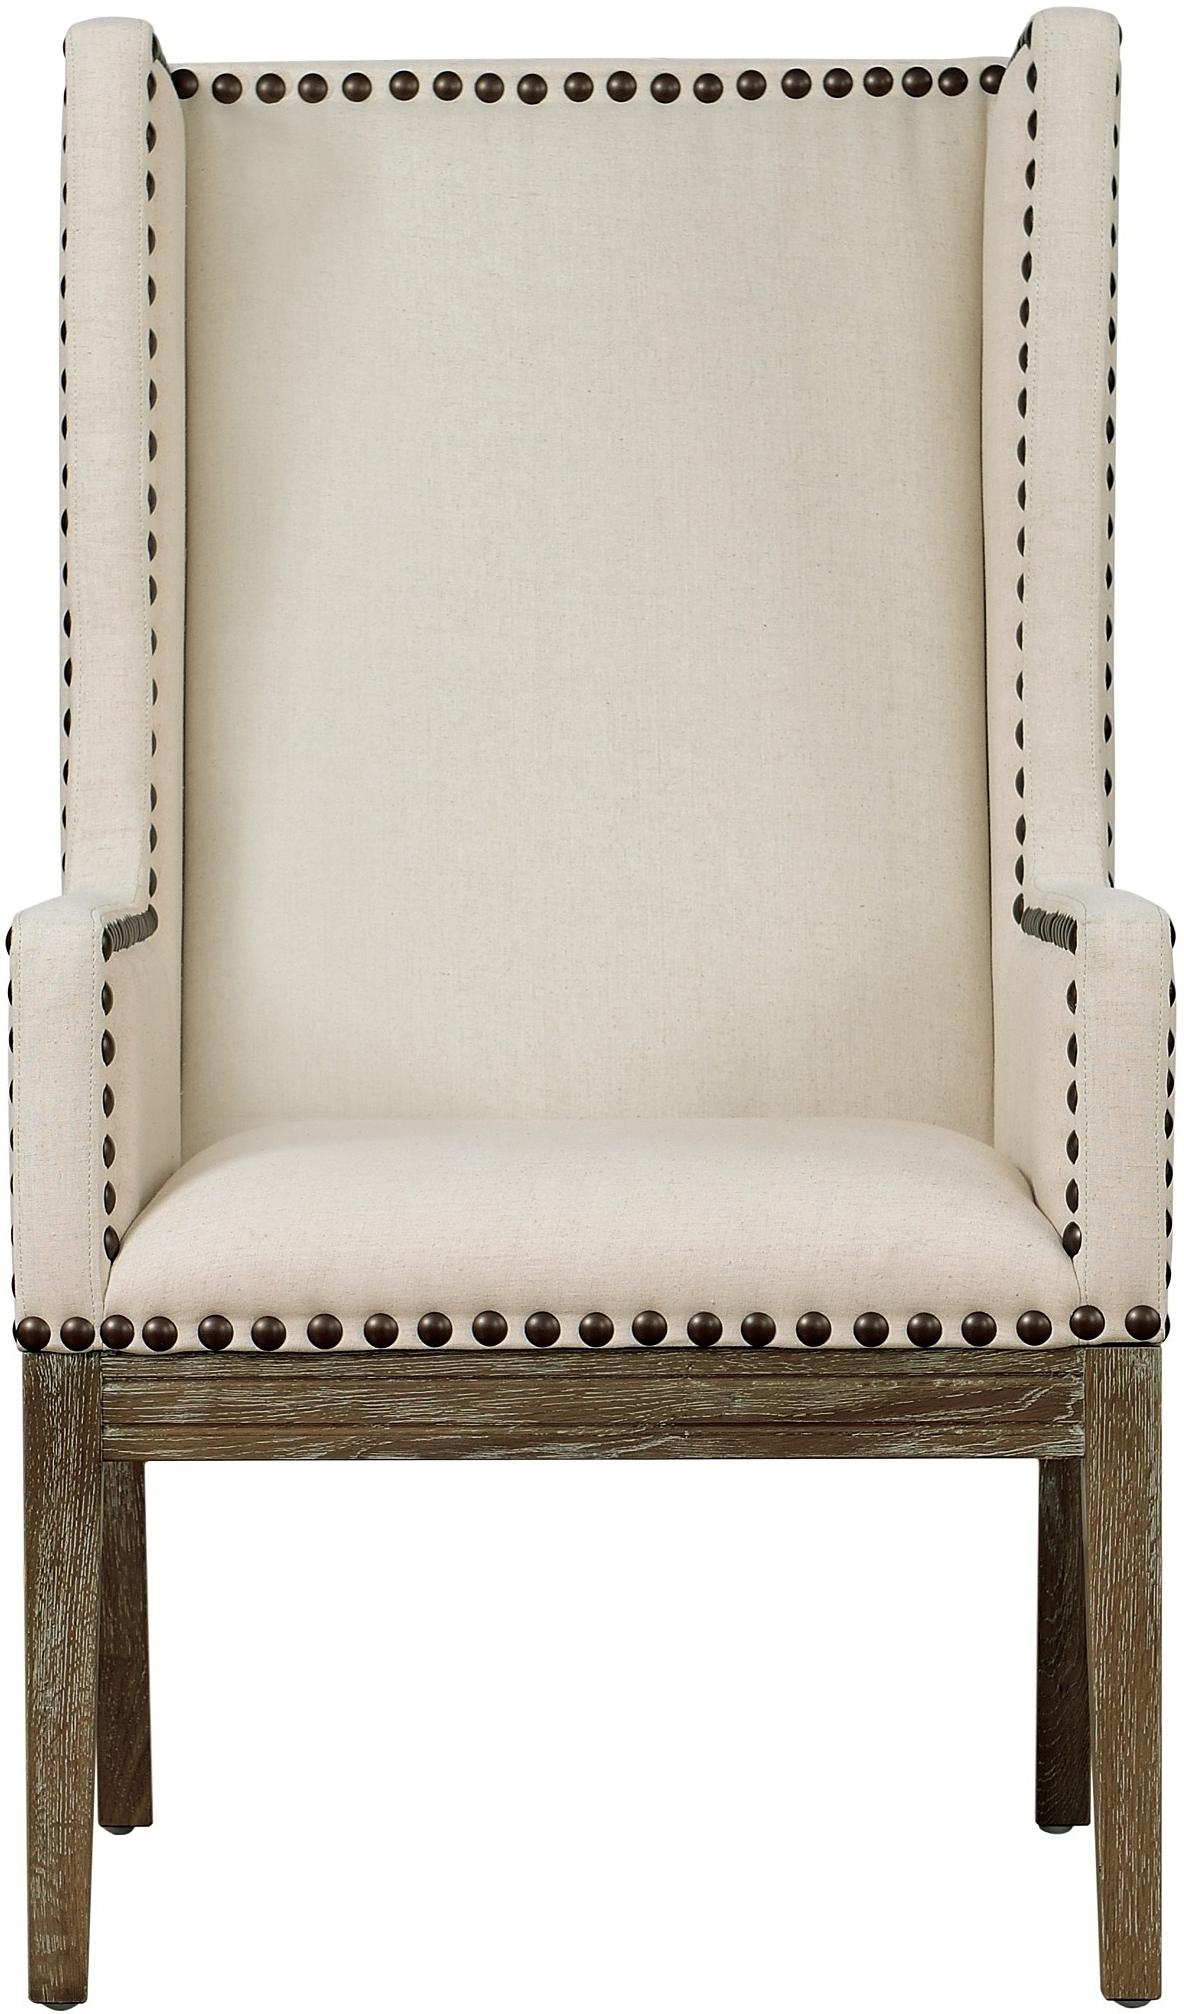 the velvet orianna arm chair in beige